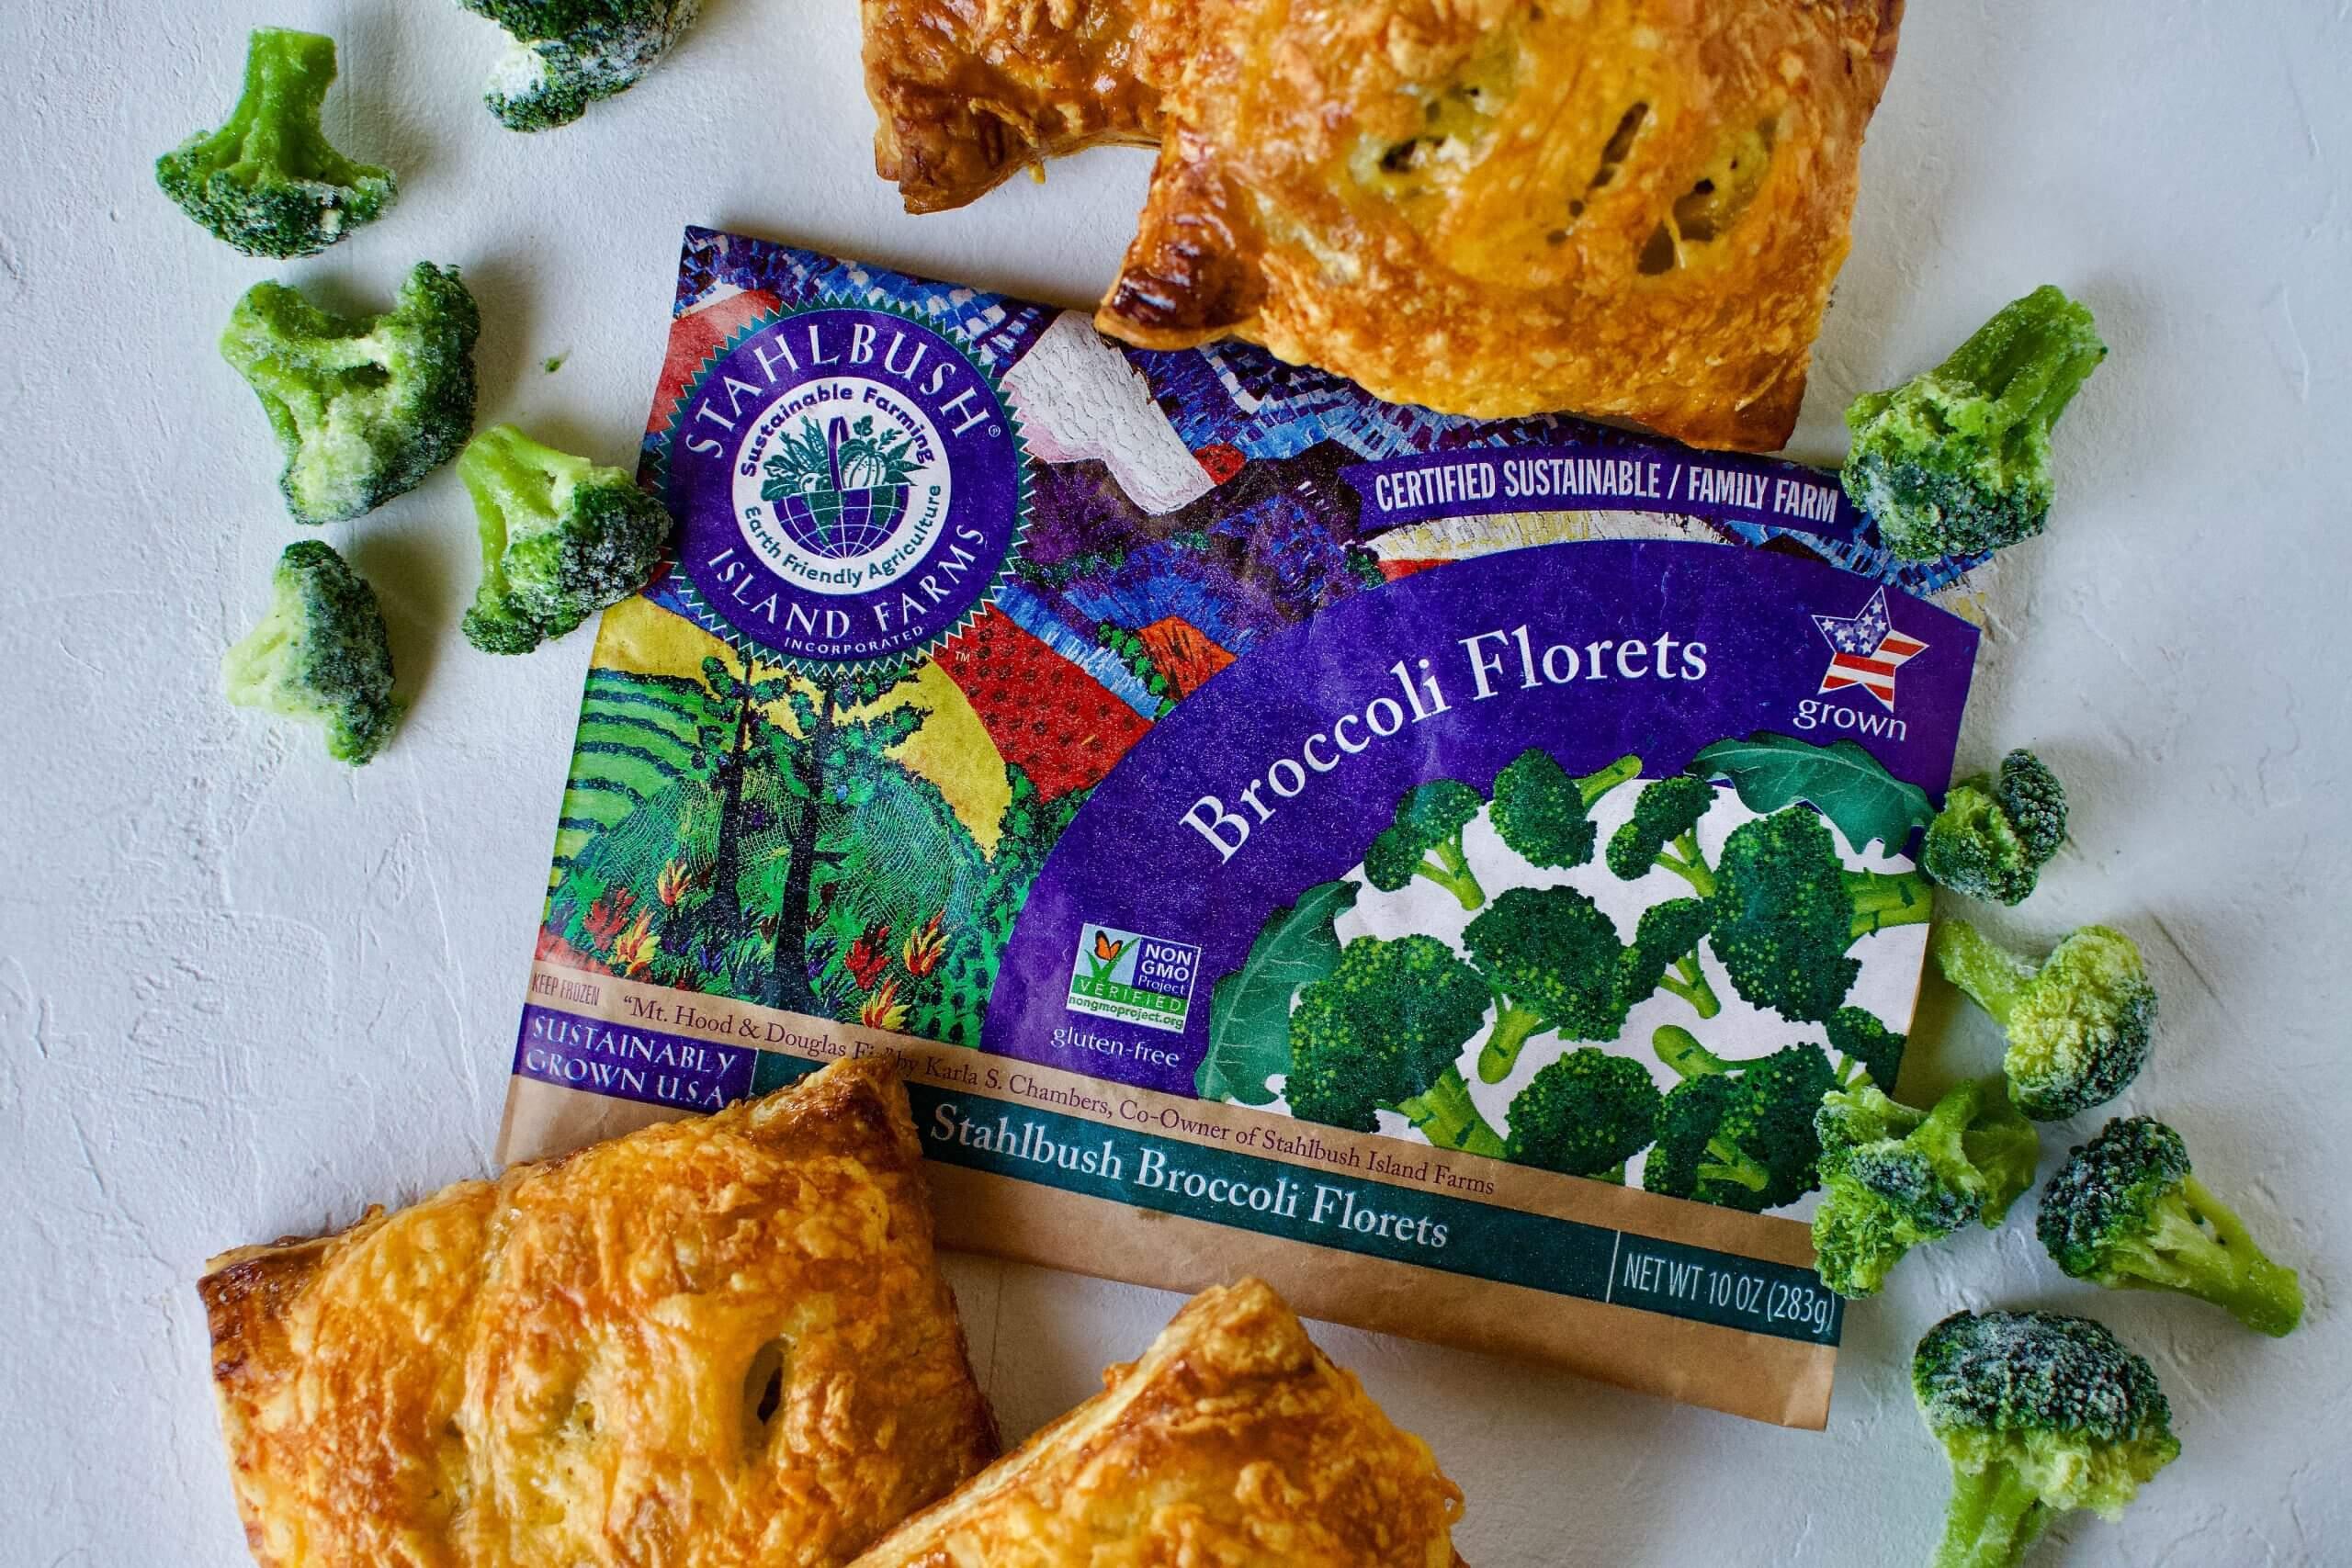 Broccoli Cheddar Puff Pastry Hand Pies Stahlbush Island Farms Frozen Broccoli